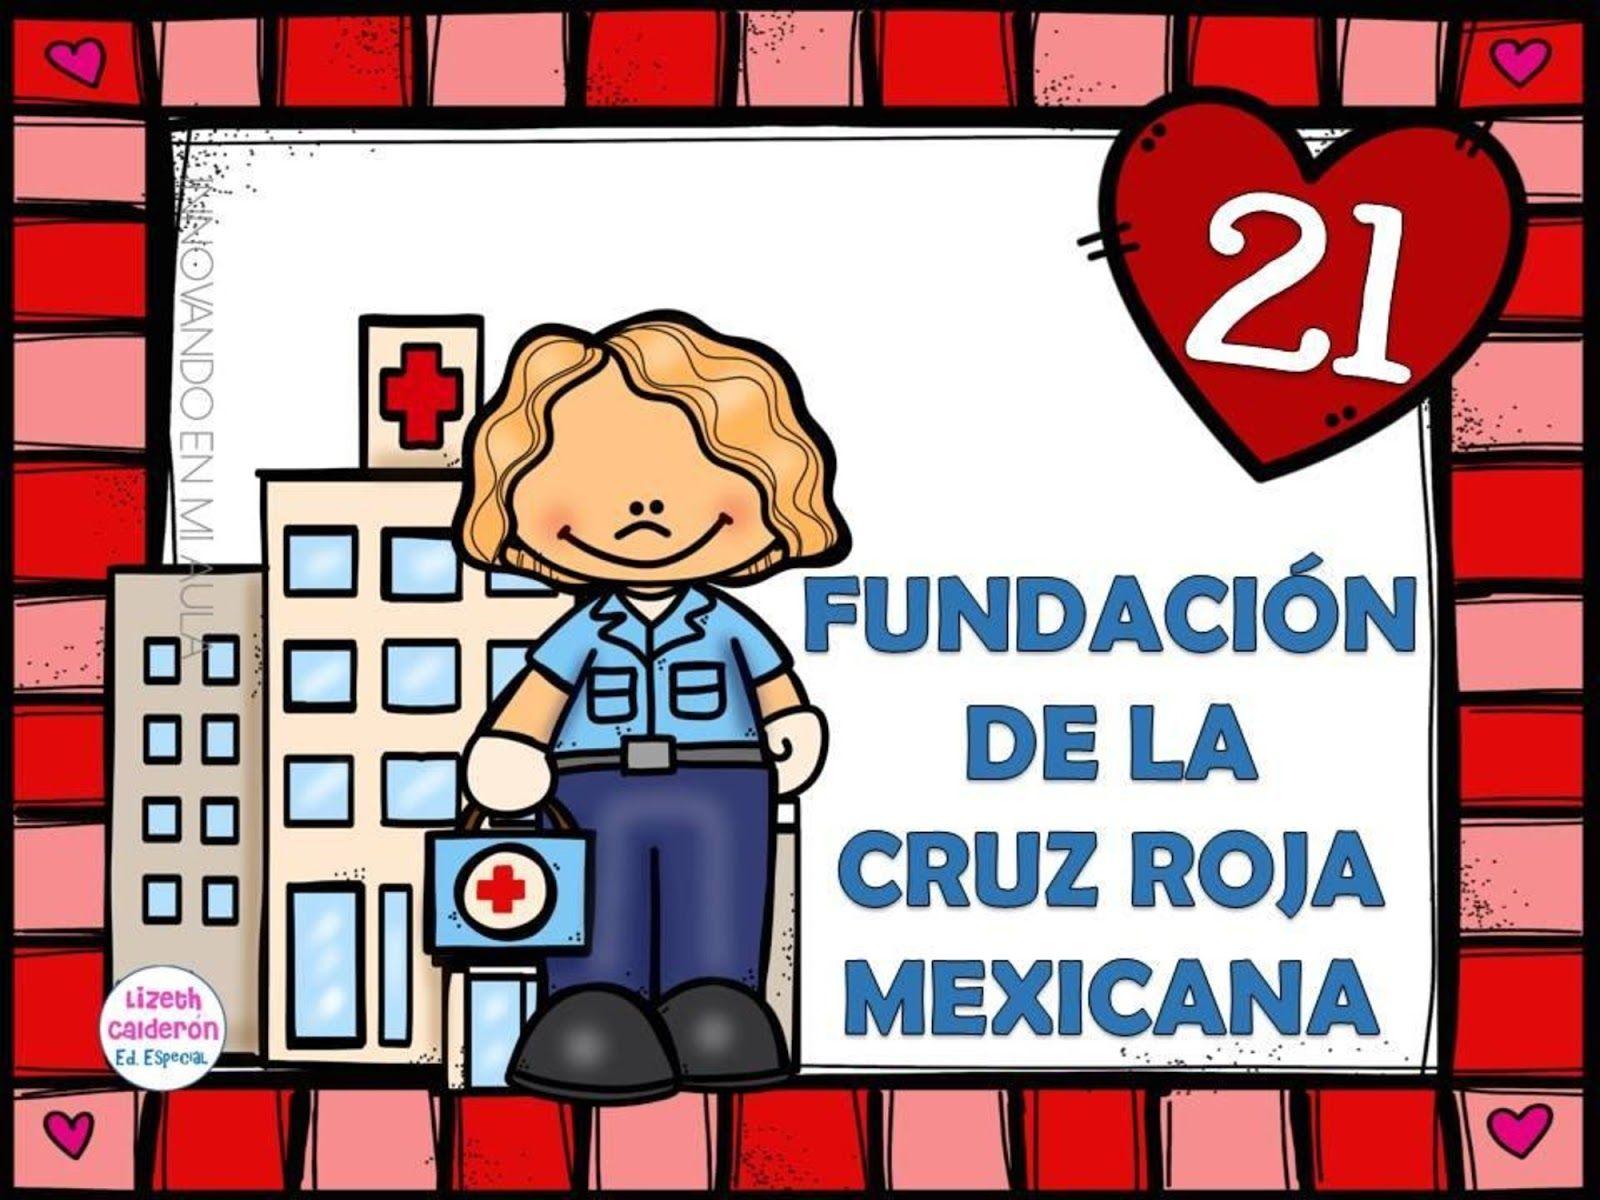 Tu Tarea Fundacion De La Cruz Roja Efemerides De Febrero Dia De La Constitucion Periodico Mural